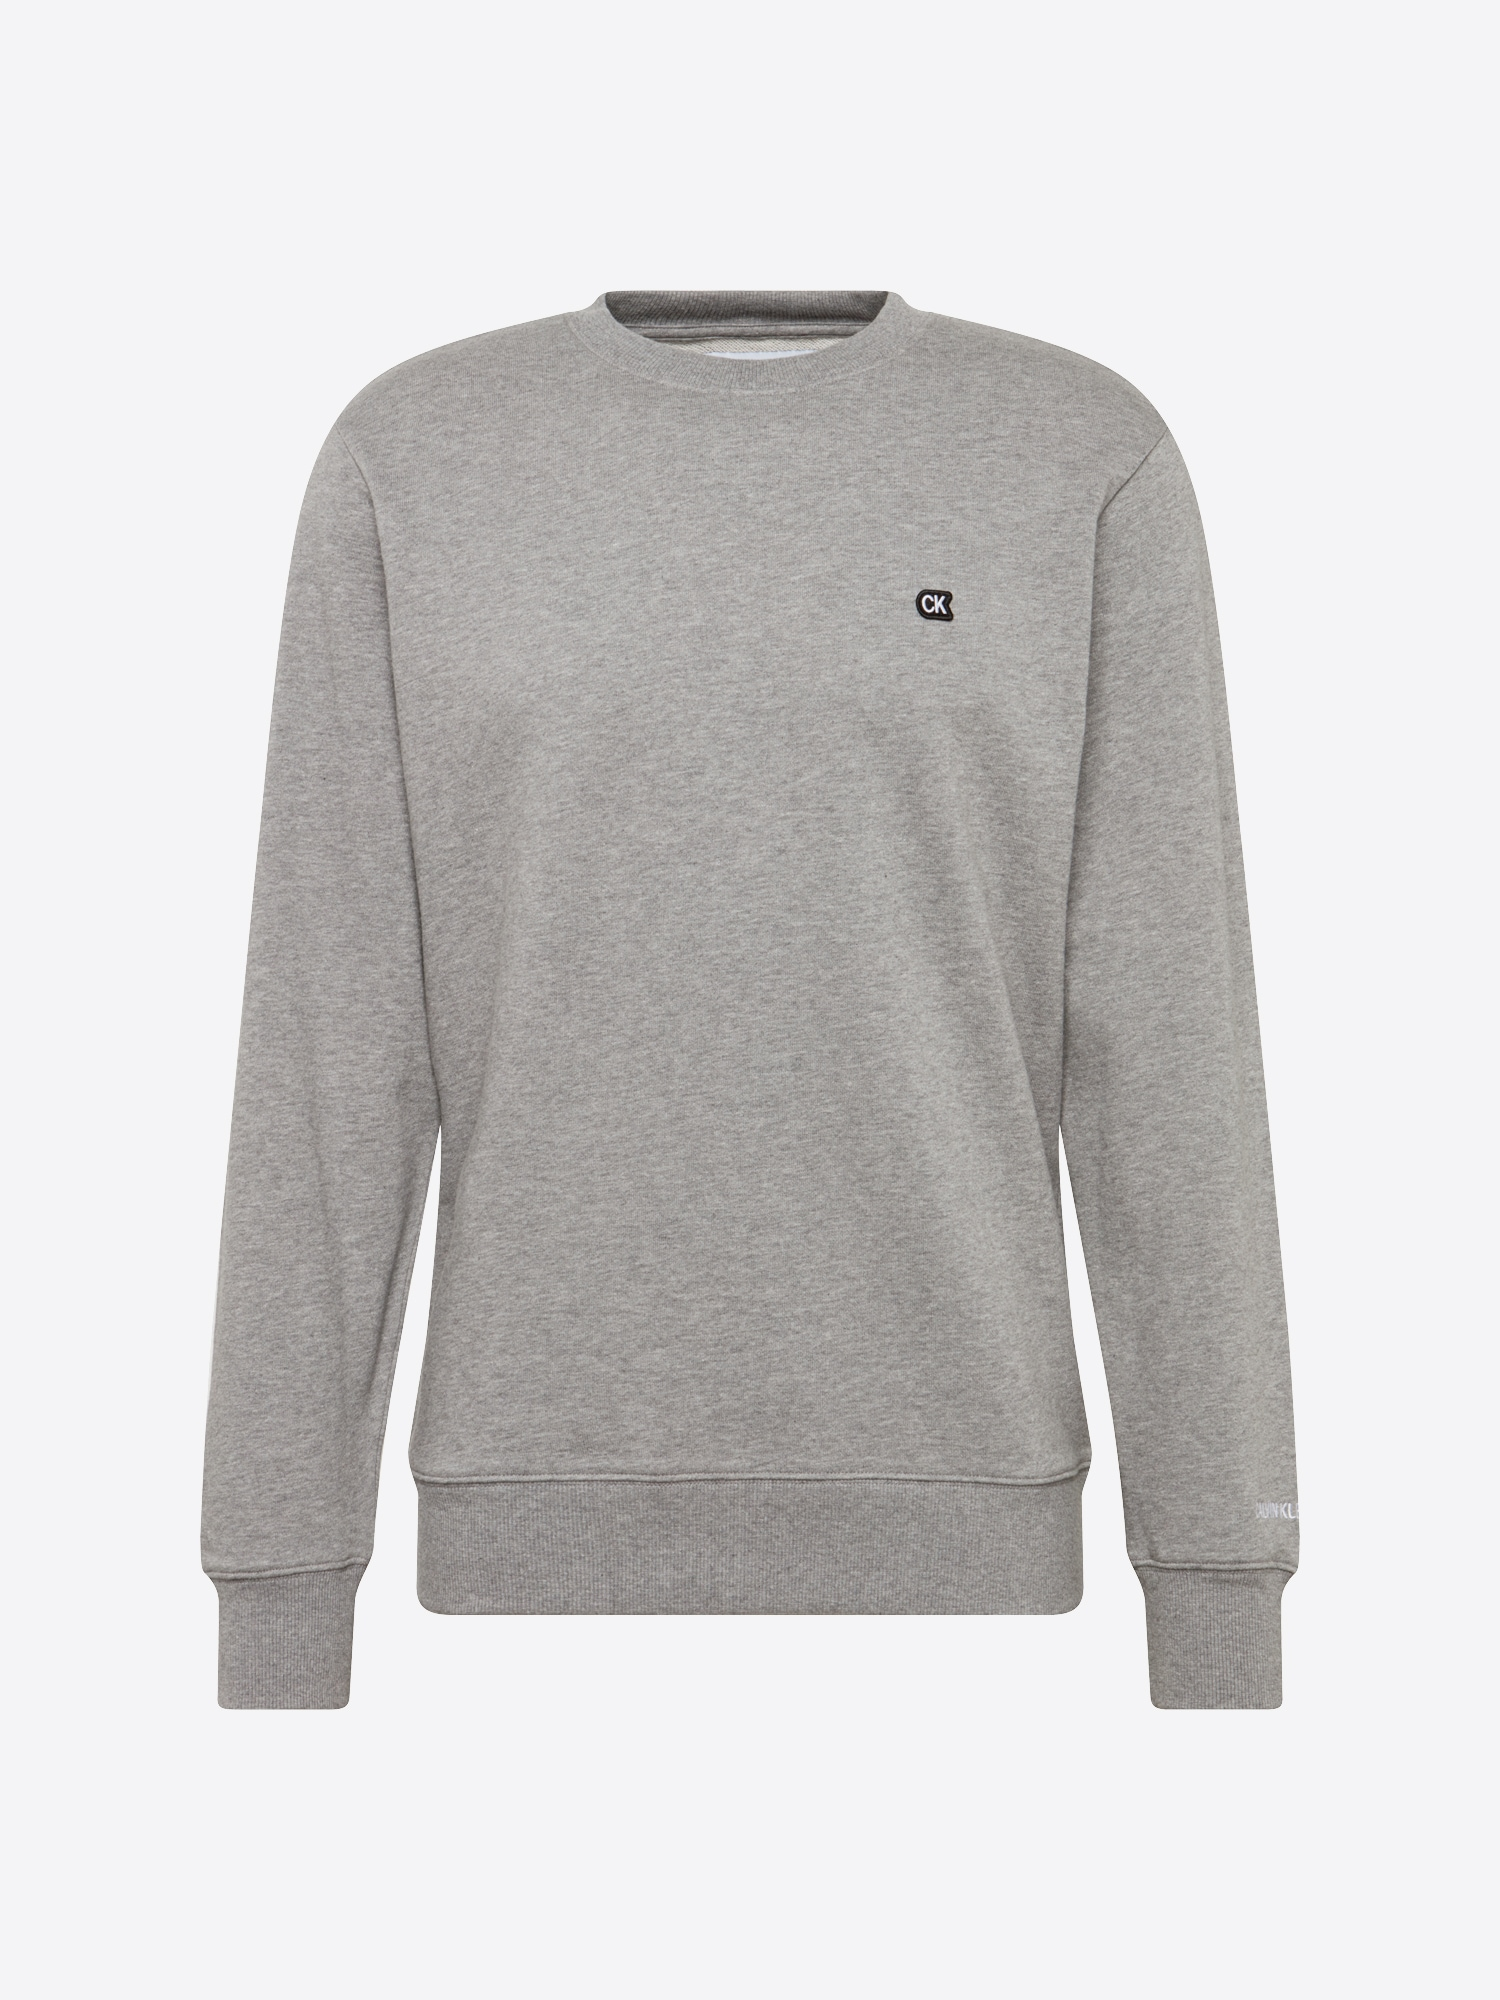 Sweatshirt 'CKJ CHEST EMBROIDERY CREW NECK'